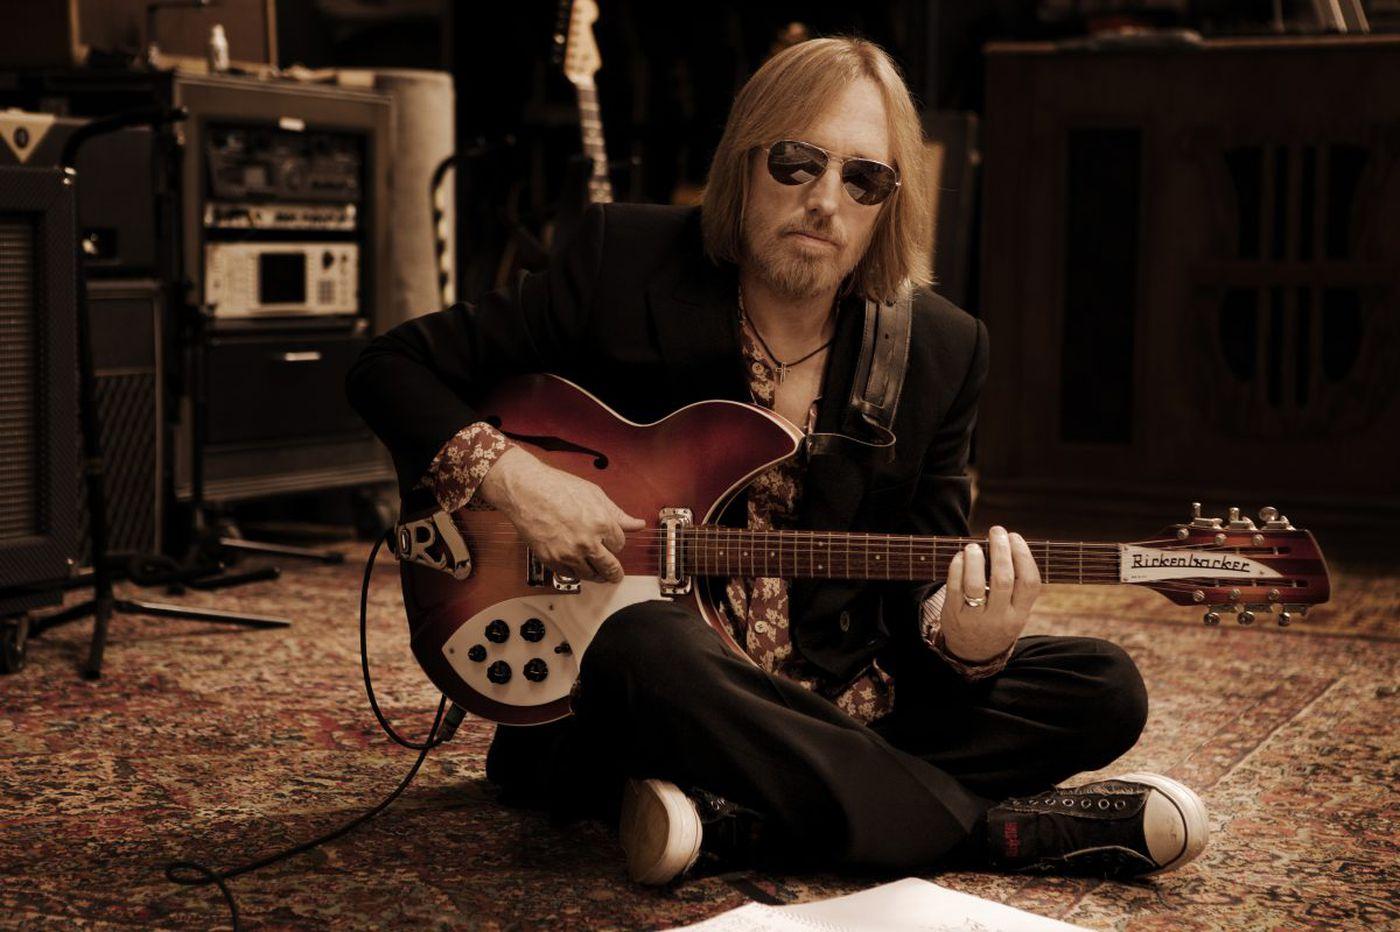 Tom Petty in grave condition at LA hospital